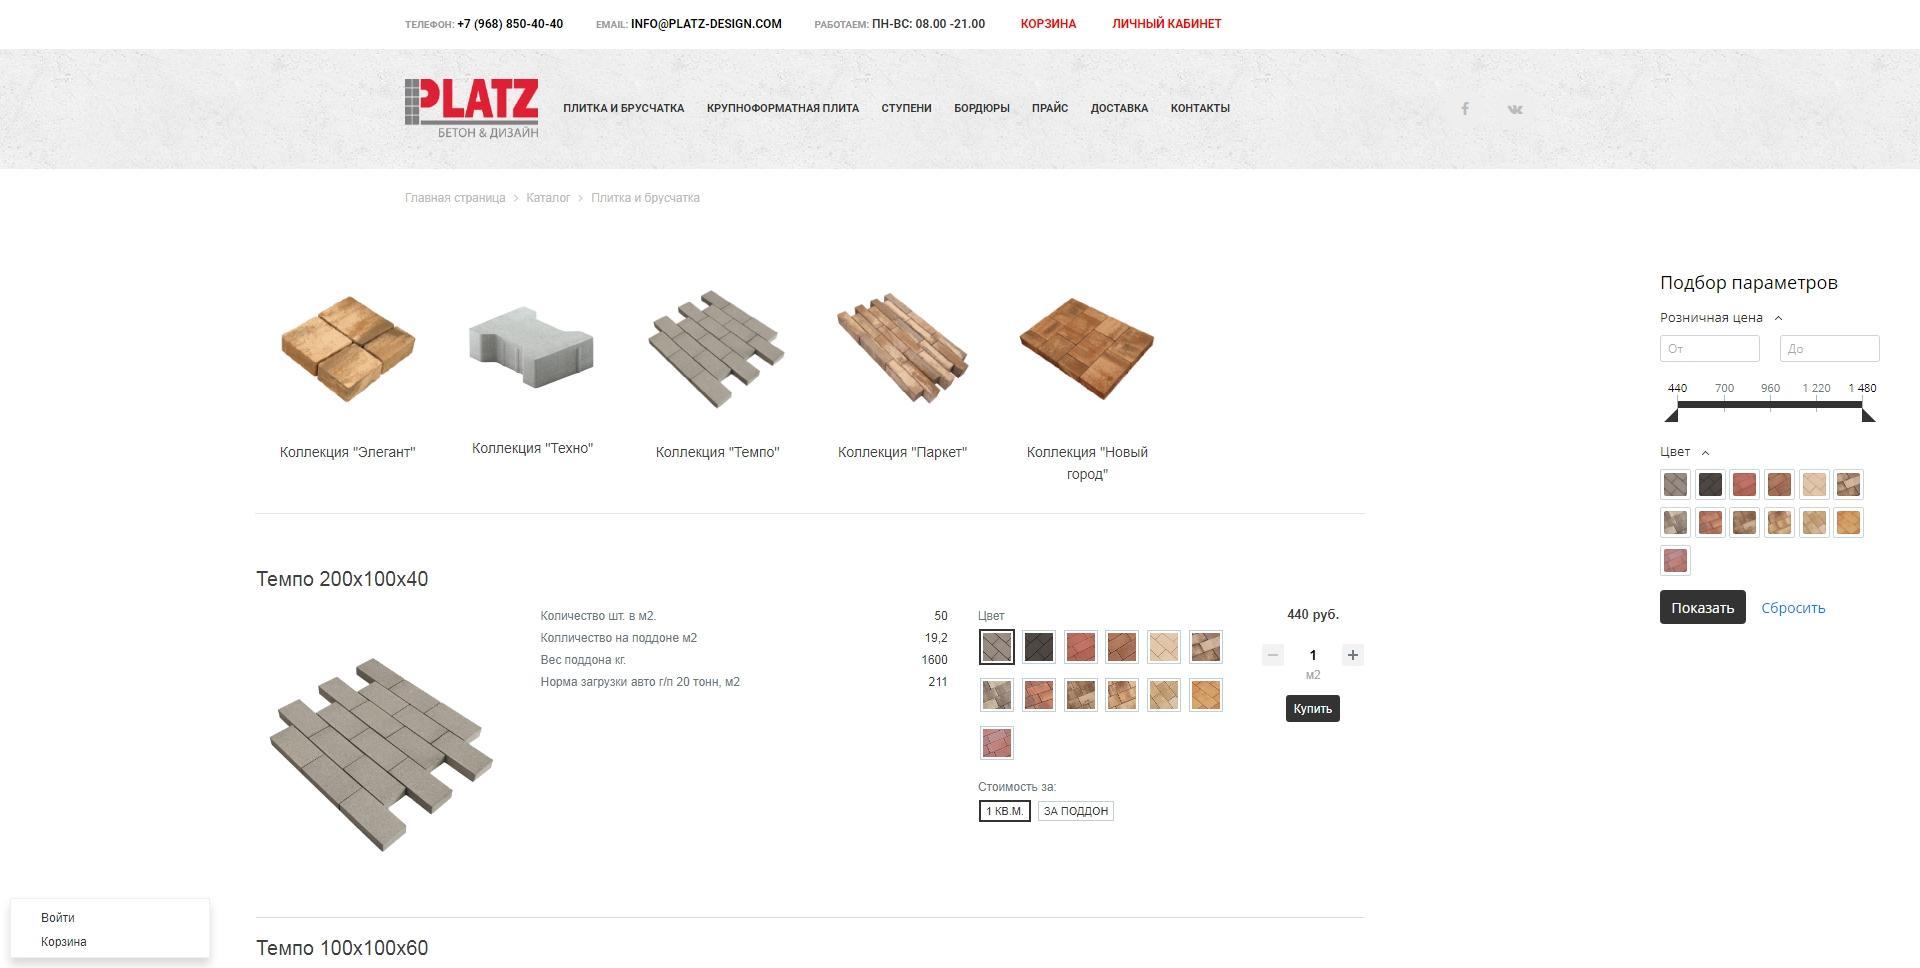 Интернет-магазин битрикс24